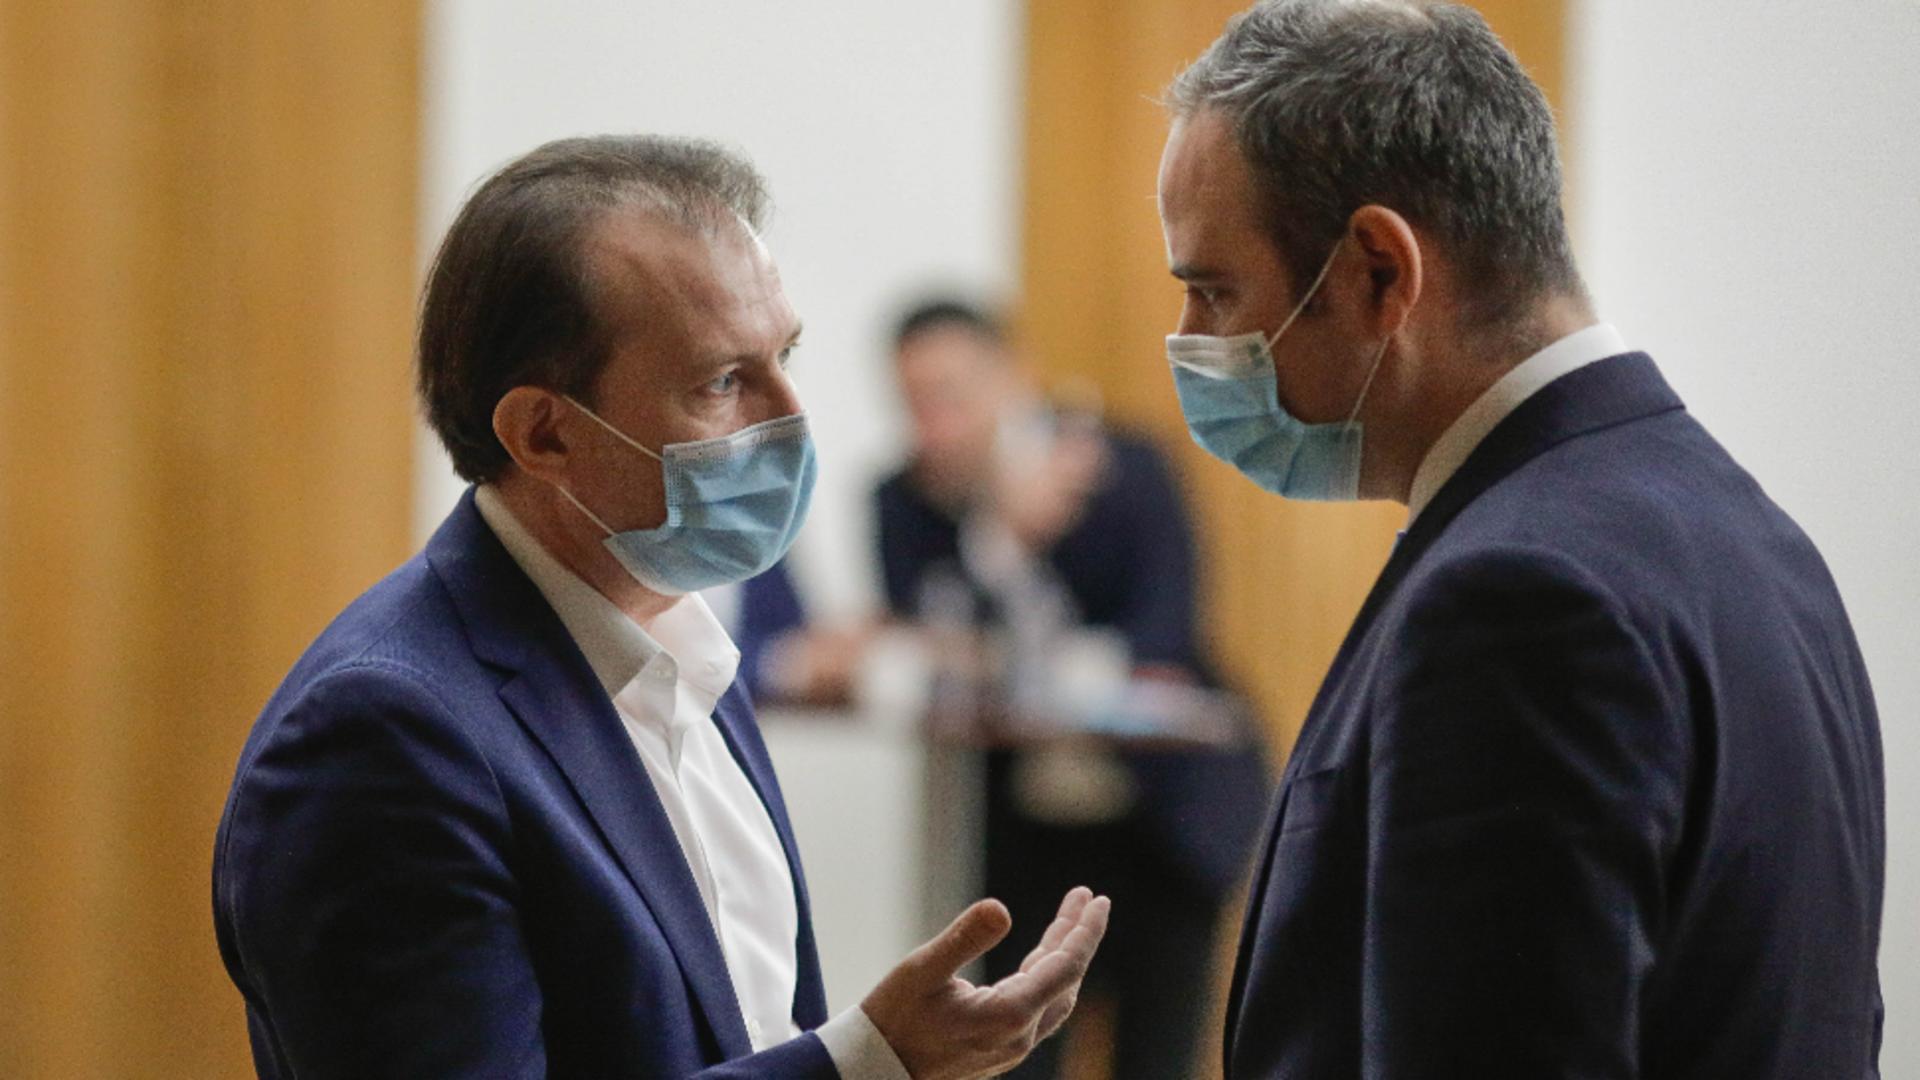 Premierul Florin Cîțu l-a remaniat pe ministrul Finanțelor, Alexandru Nazare. Foto/Inquam